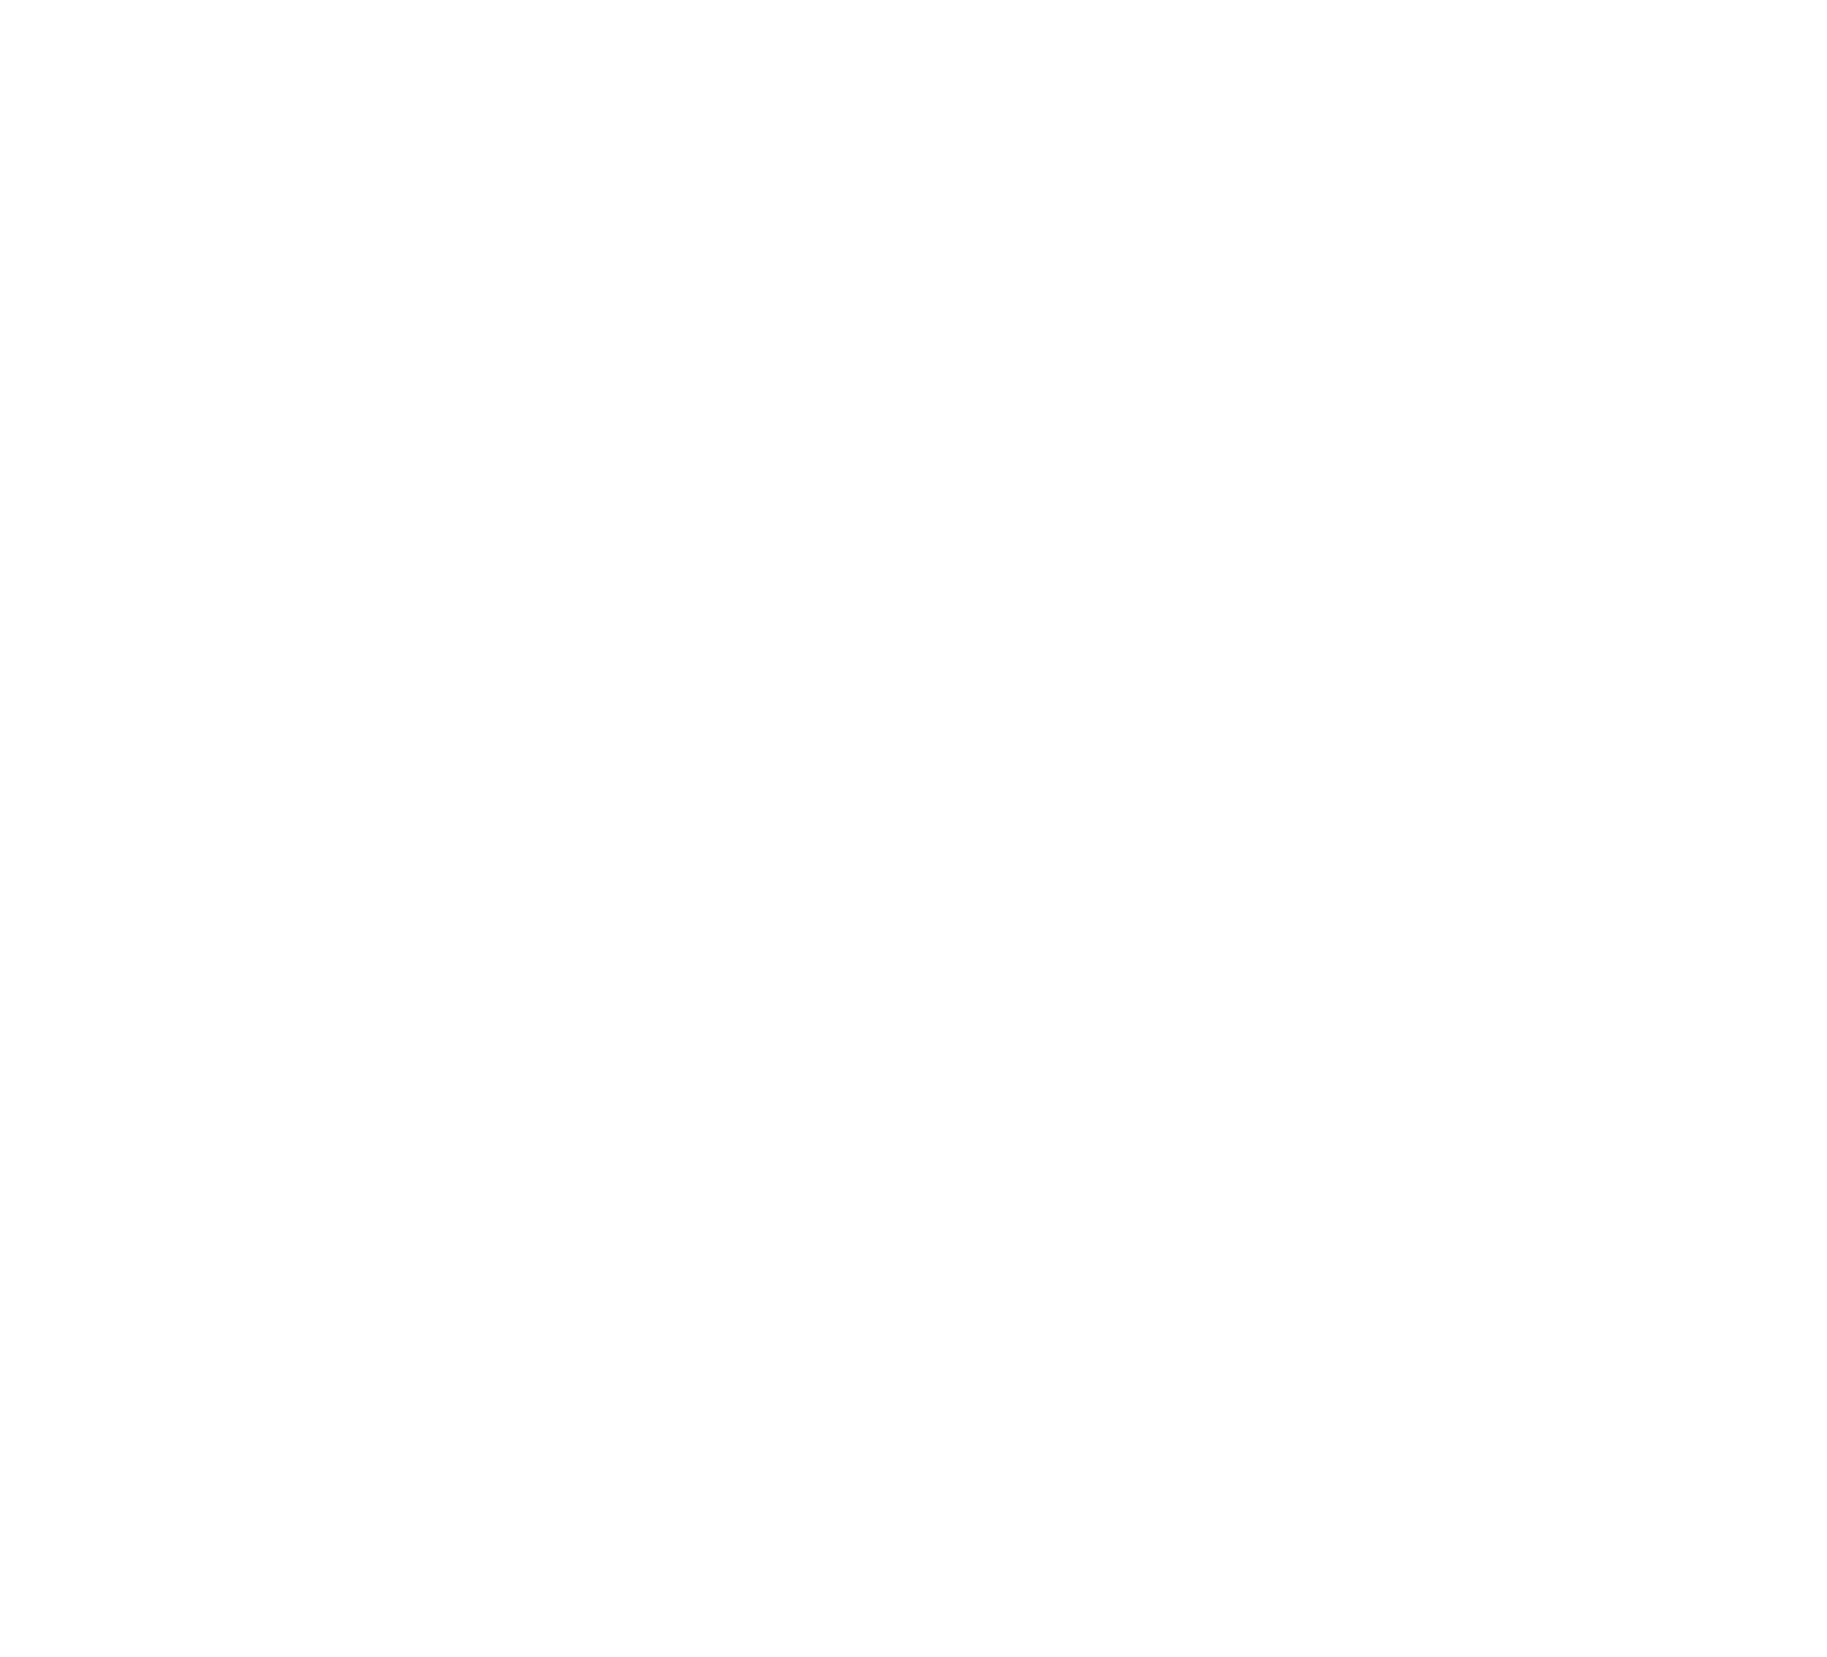 Electronic heart vector image